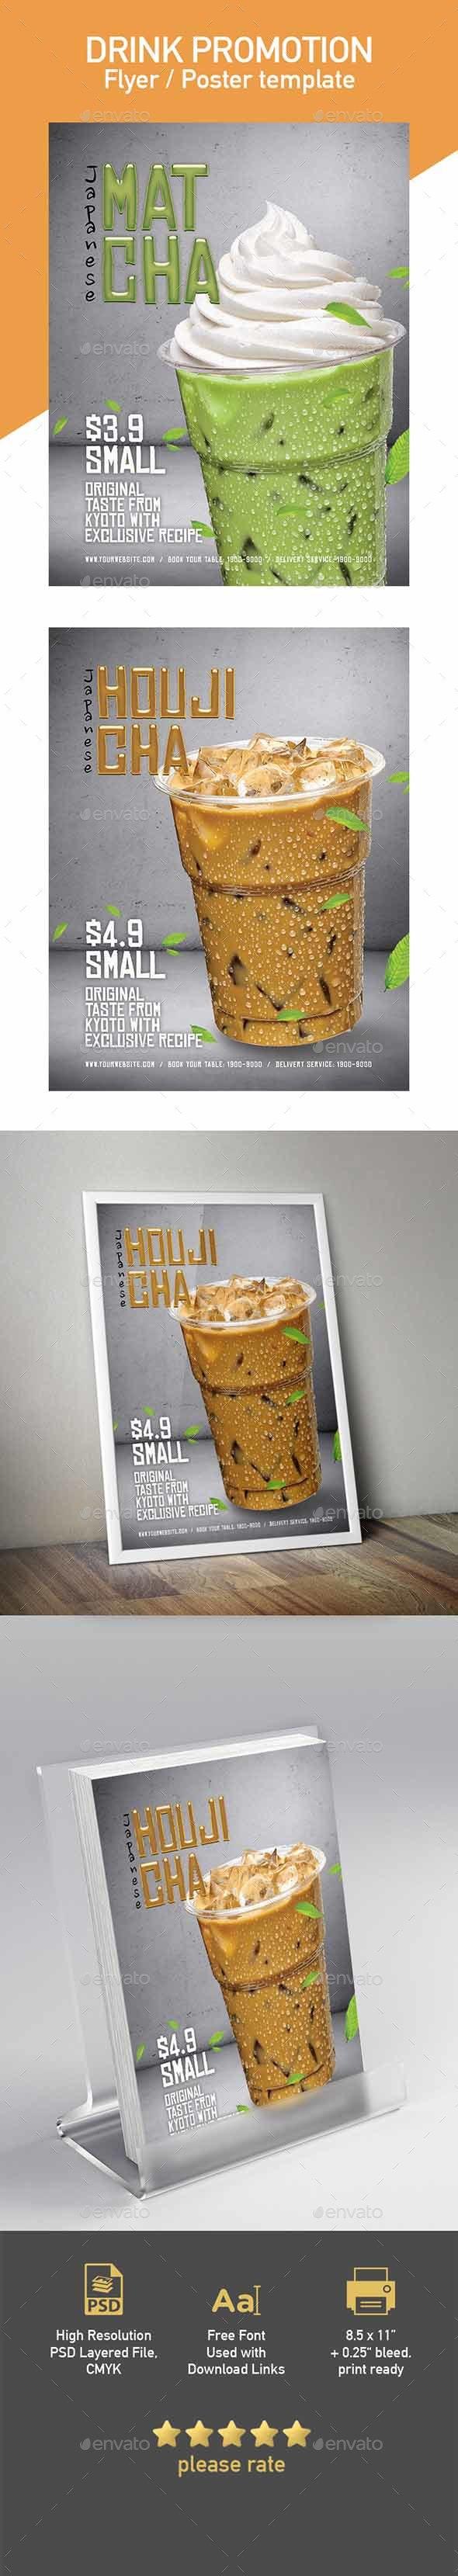 Matcha & Houjicha Flyer / Poster Template - Flyers Print Templates